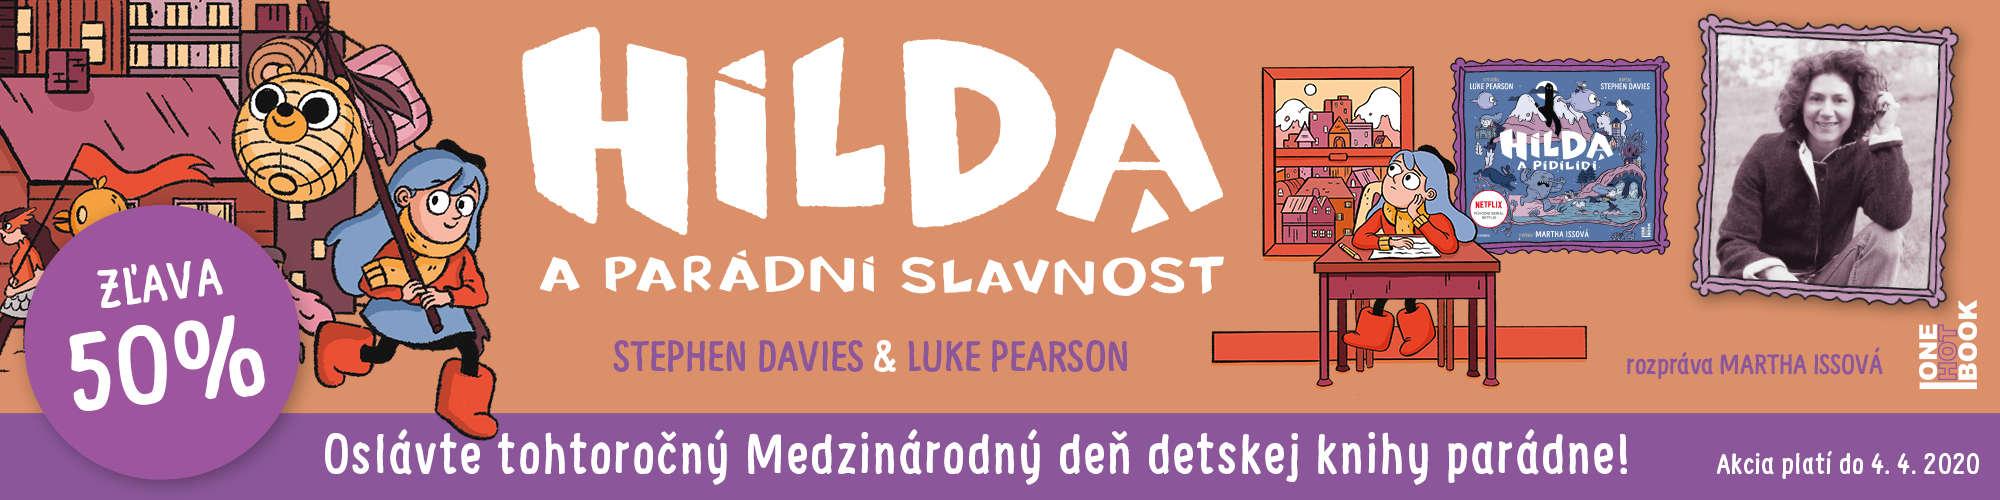 Hilda akce